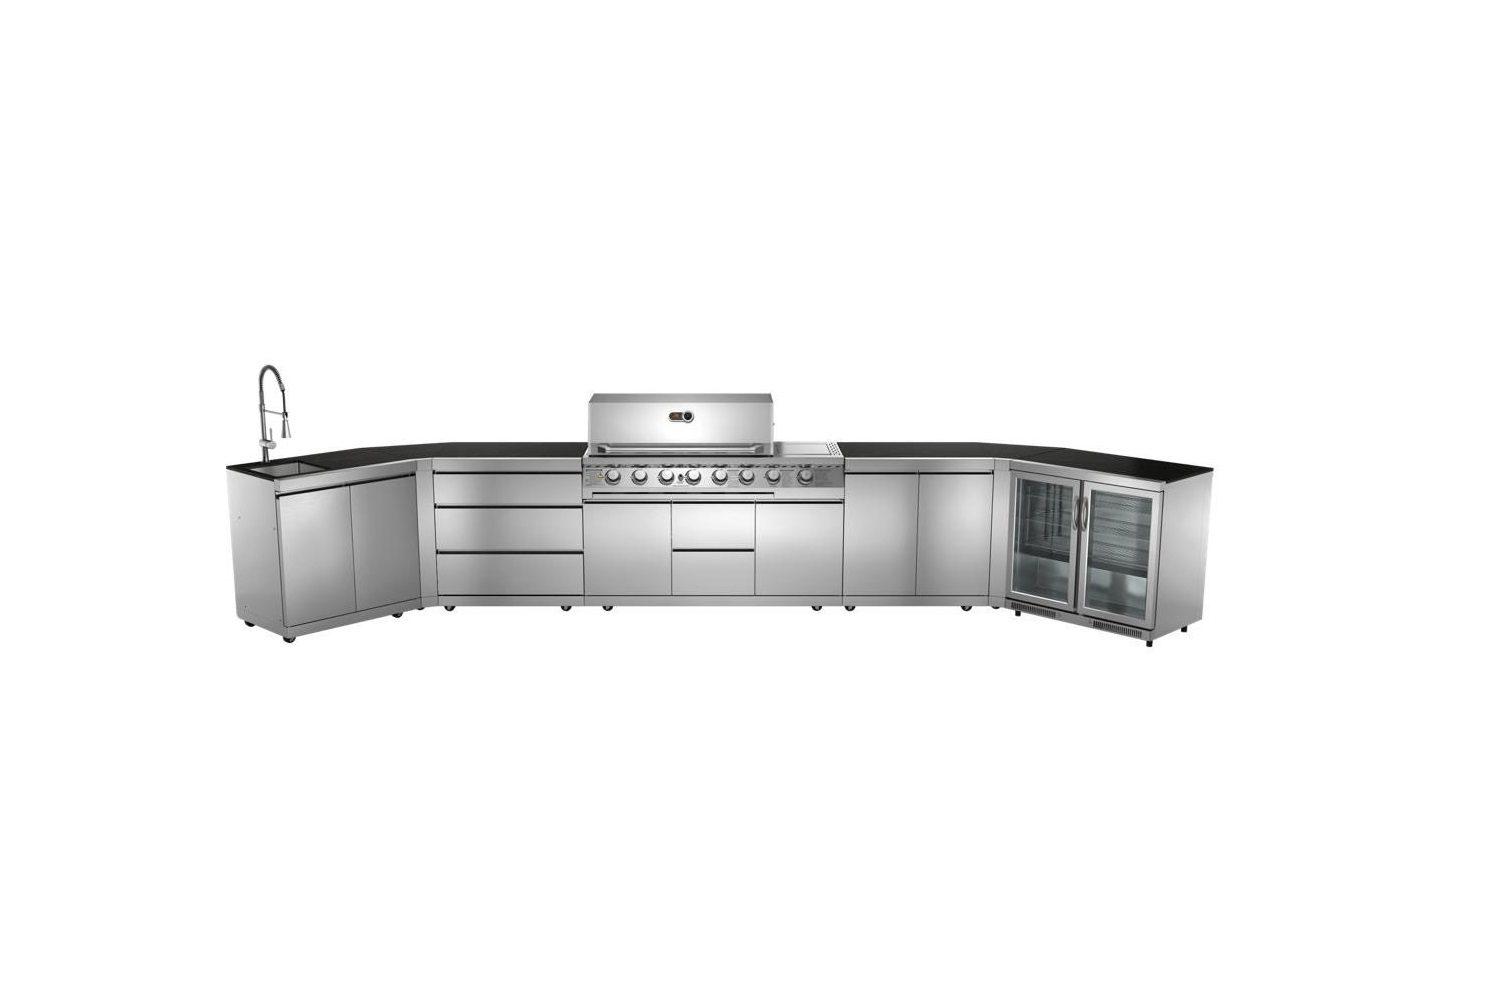 Cirencester Modular Kitchen